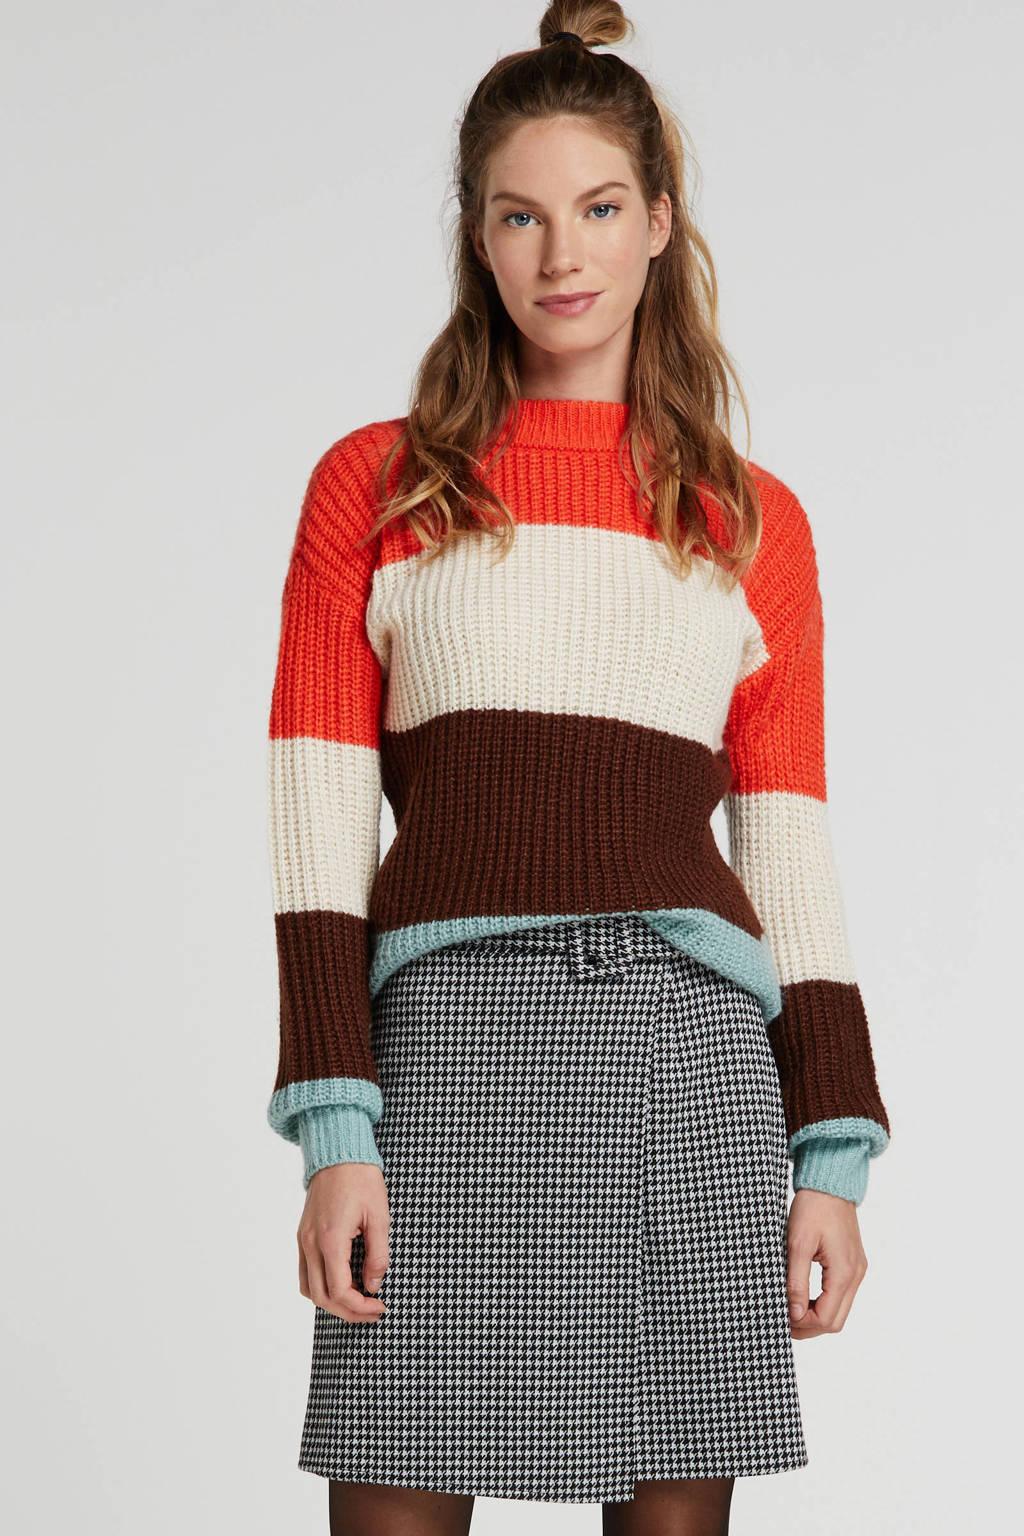 wehkamp gestreepte grofgebreide trui fel rood/mint/ecru/donkerbruin, Fel rood/mint/ecru/donkerbruin